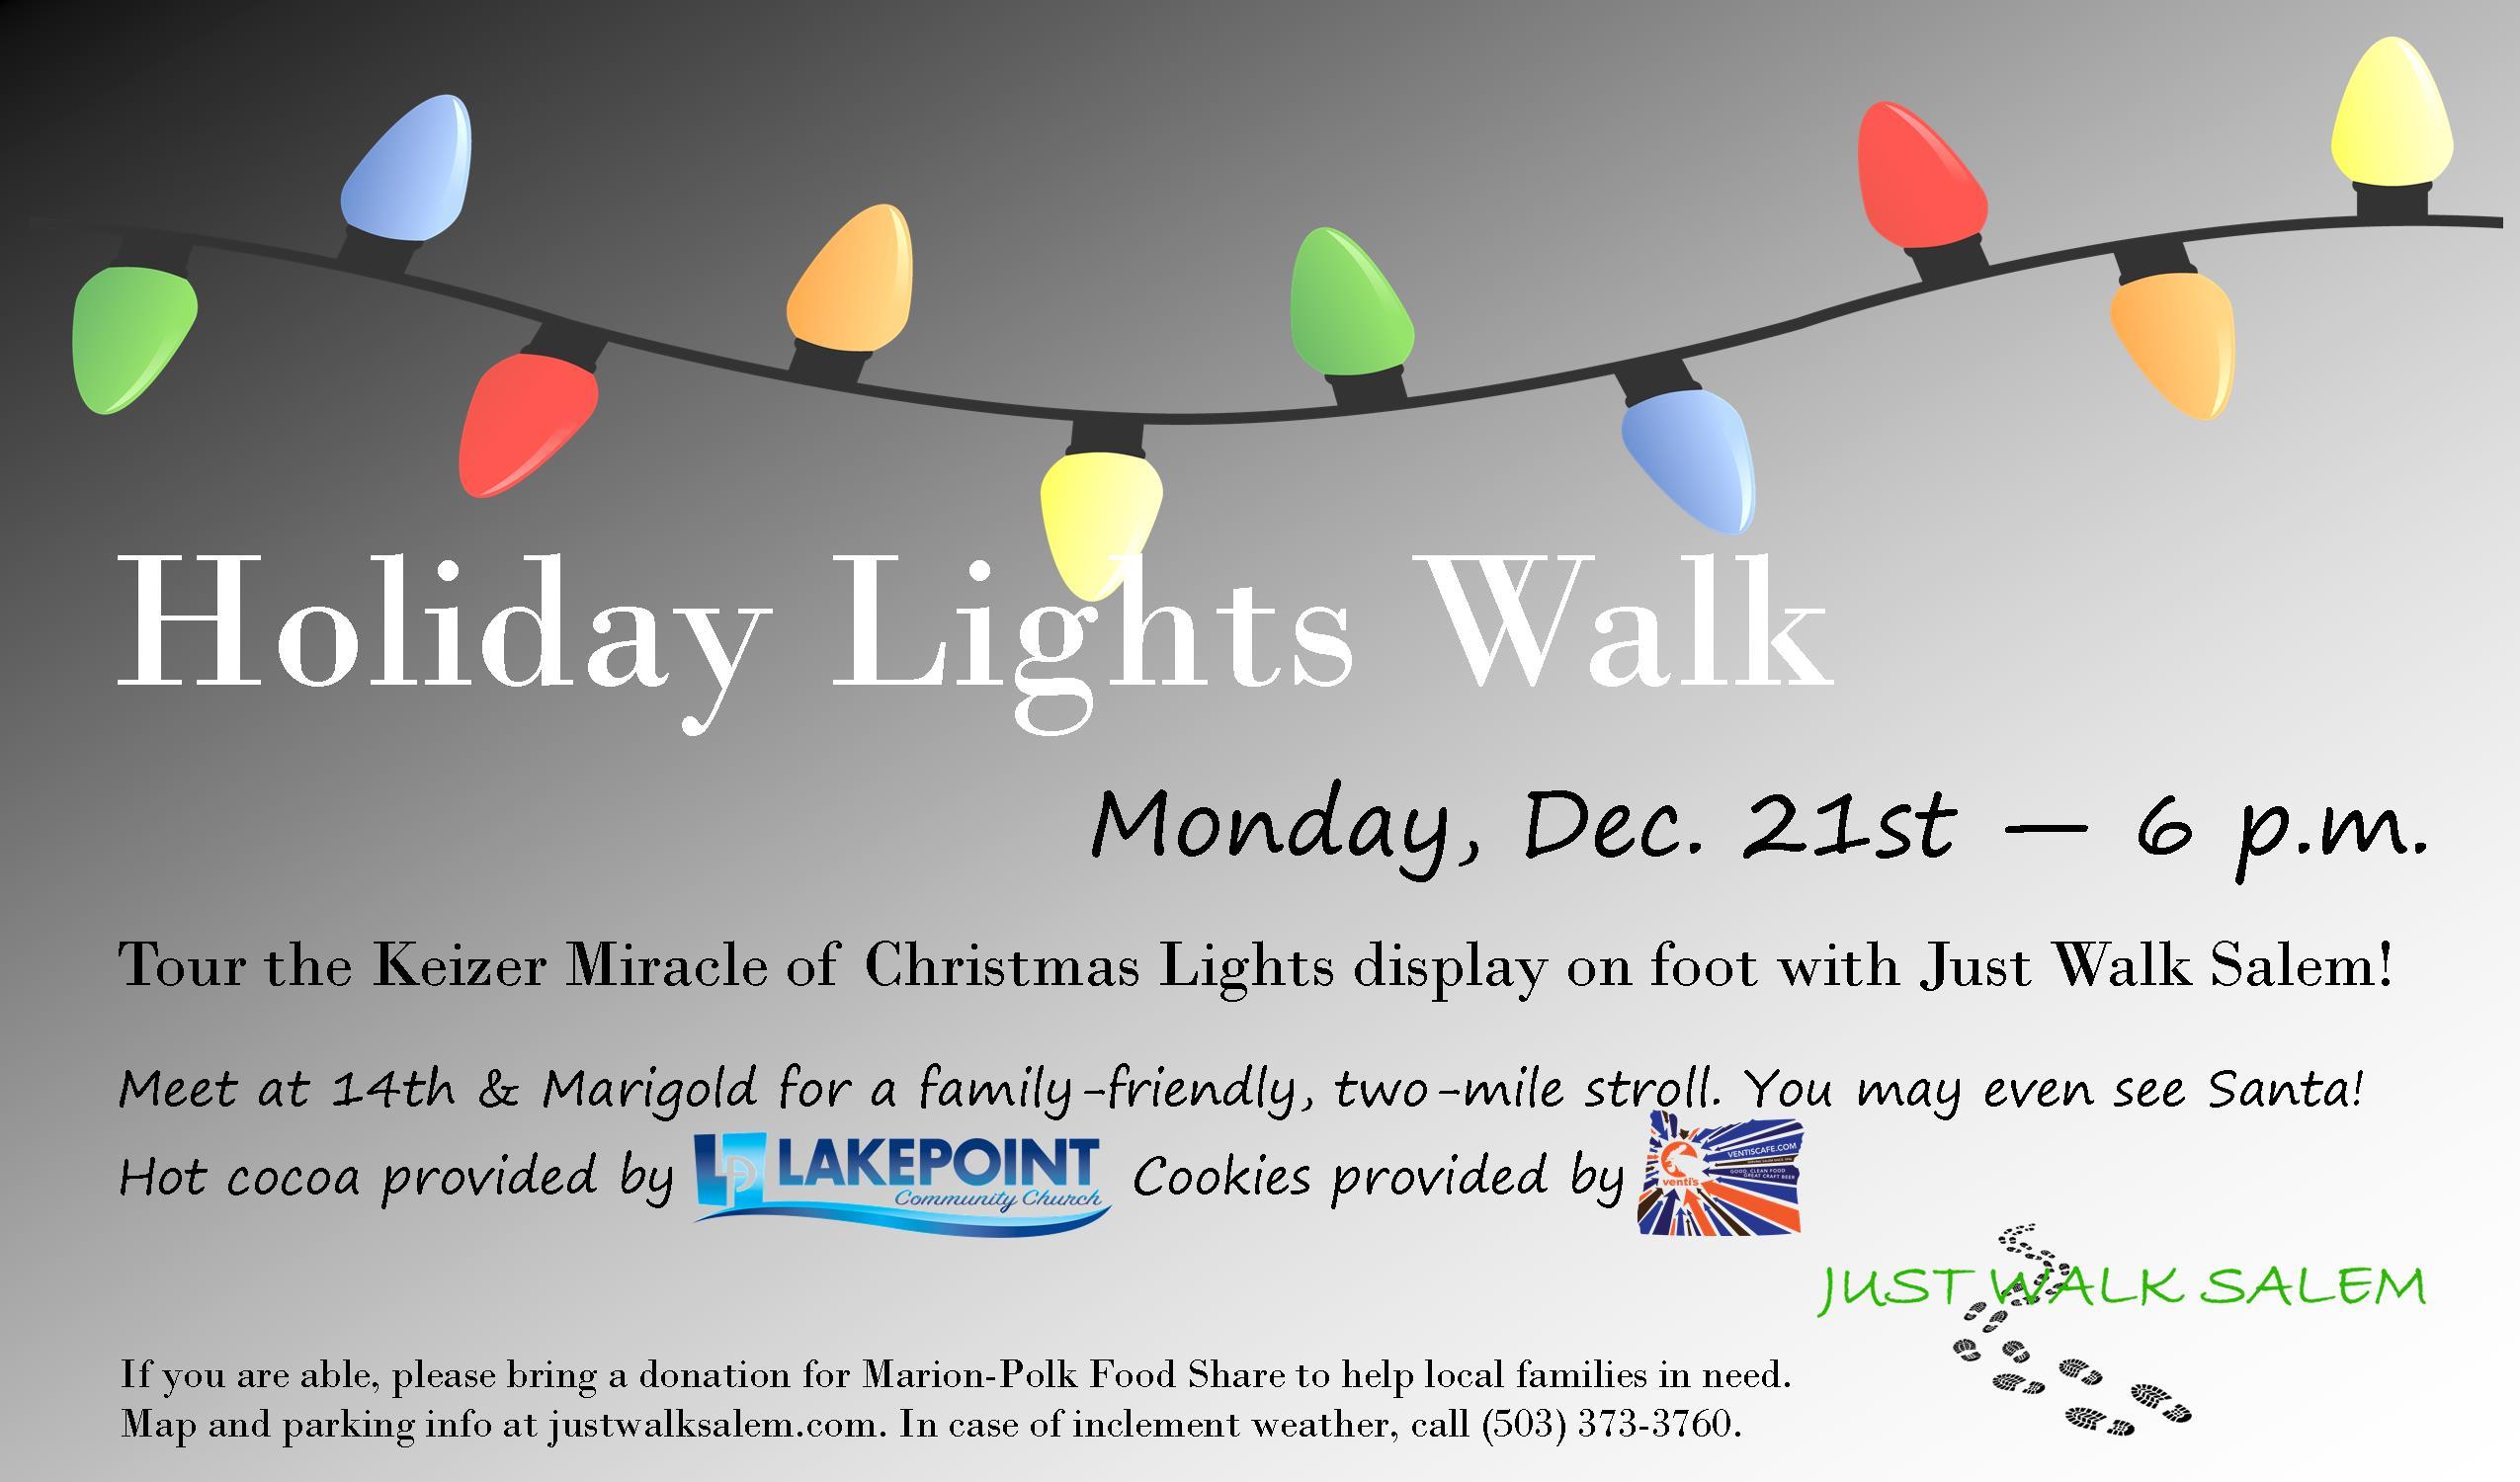 Holiday Lights Walk — Just Walk Salem Keizer